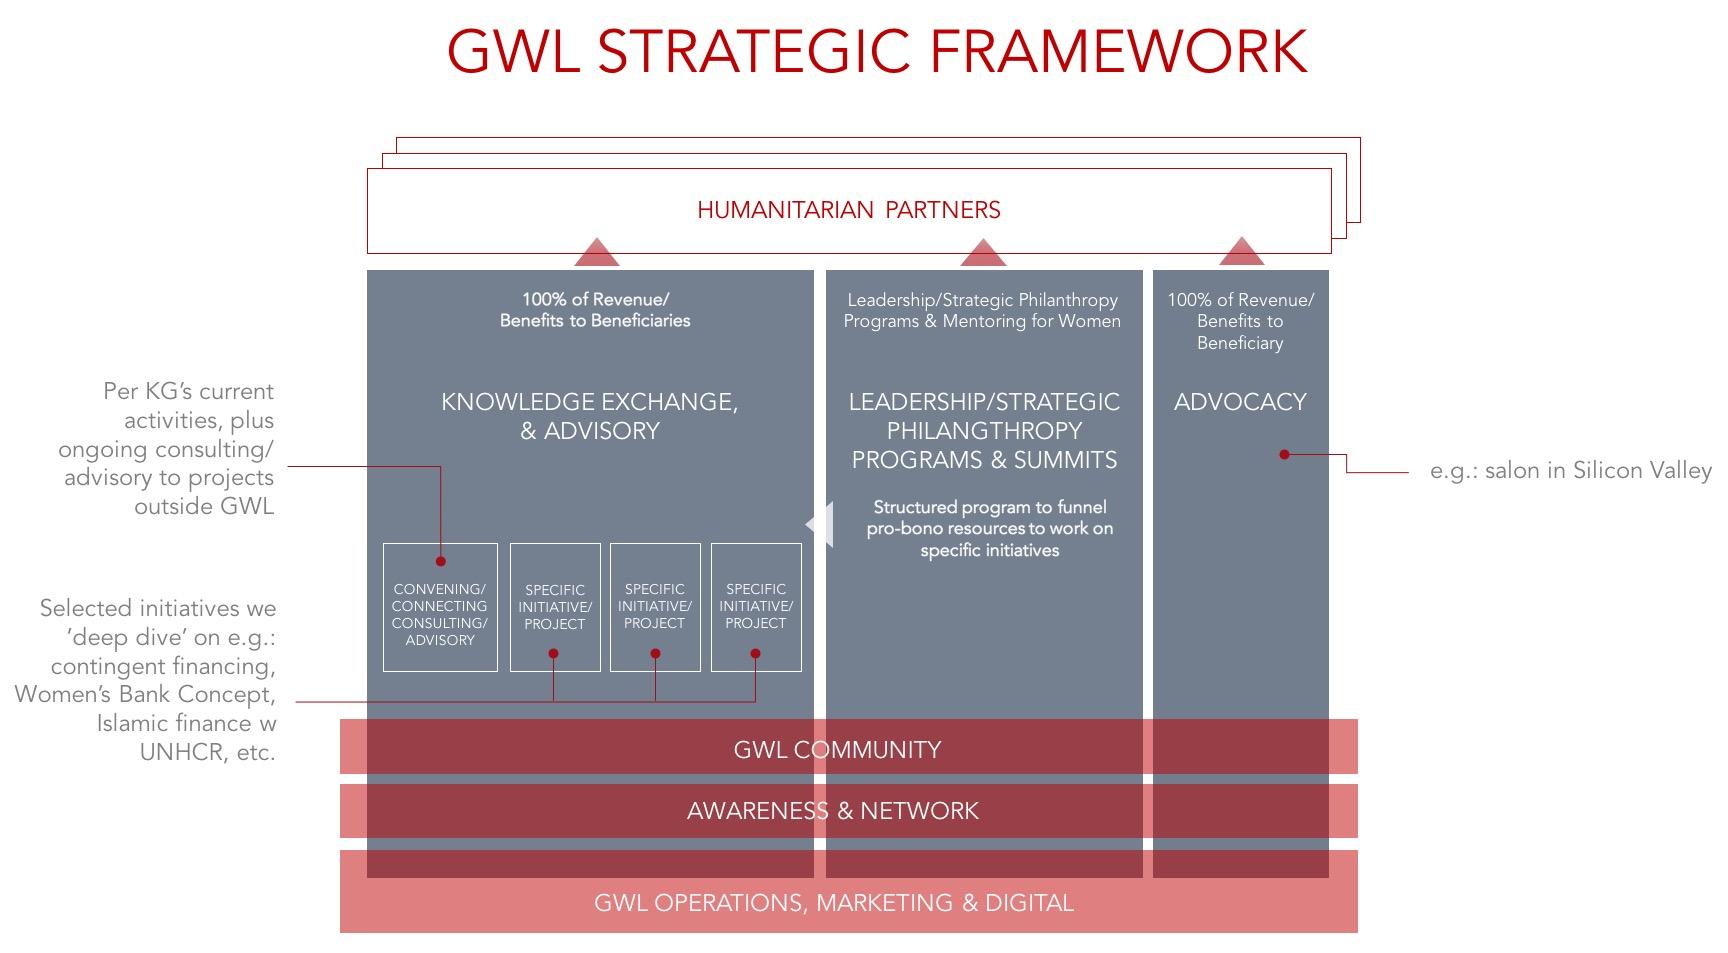 GWL Strategic Pillars Feb 2018.jpg